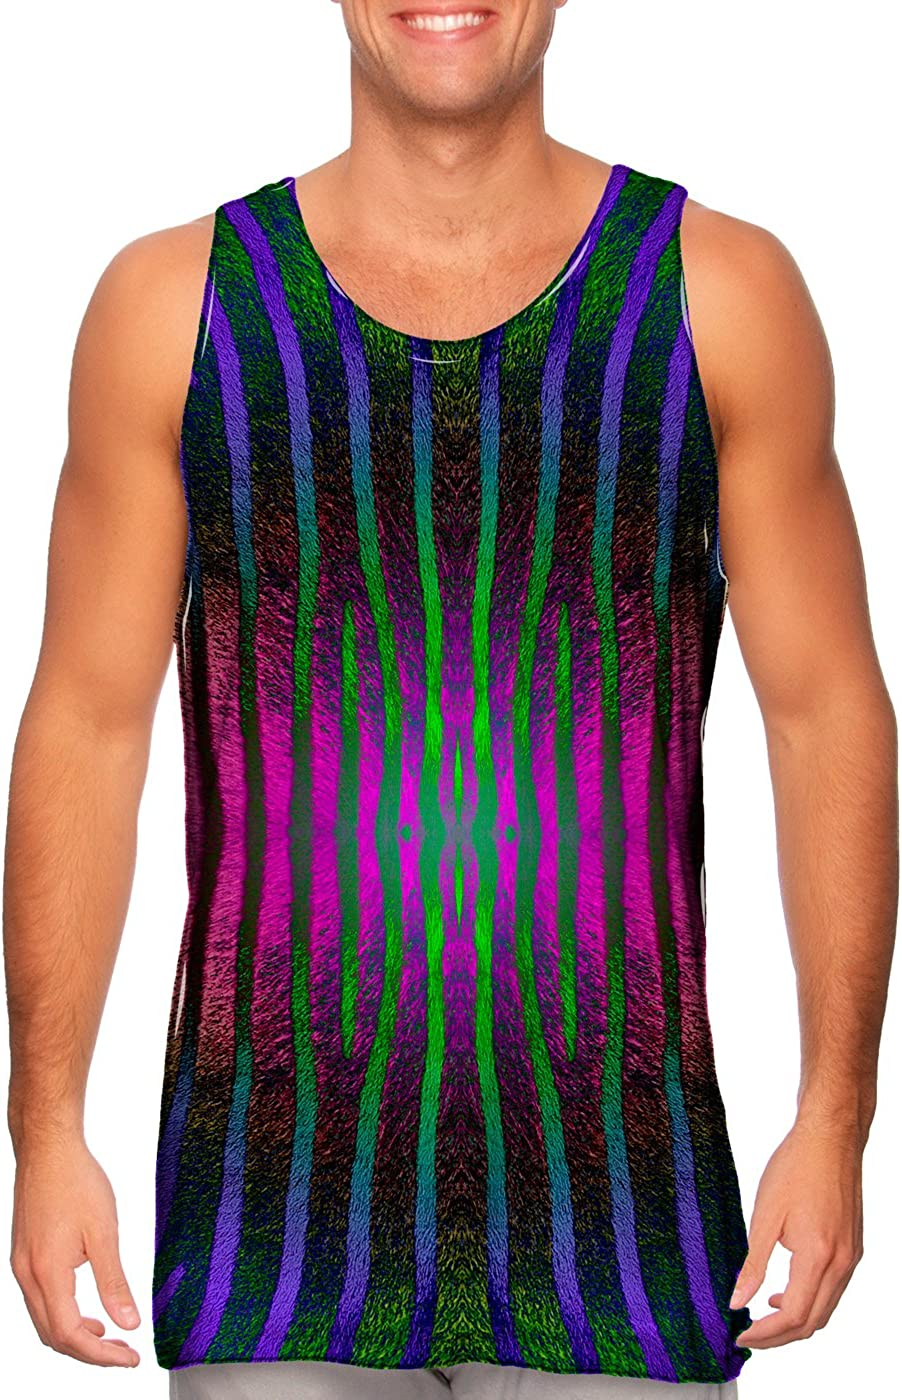 Yizzam AnimalShirtsUSA Tshirt Mens Tank Top Pink Purple Green Zebra Stripes